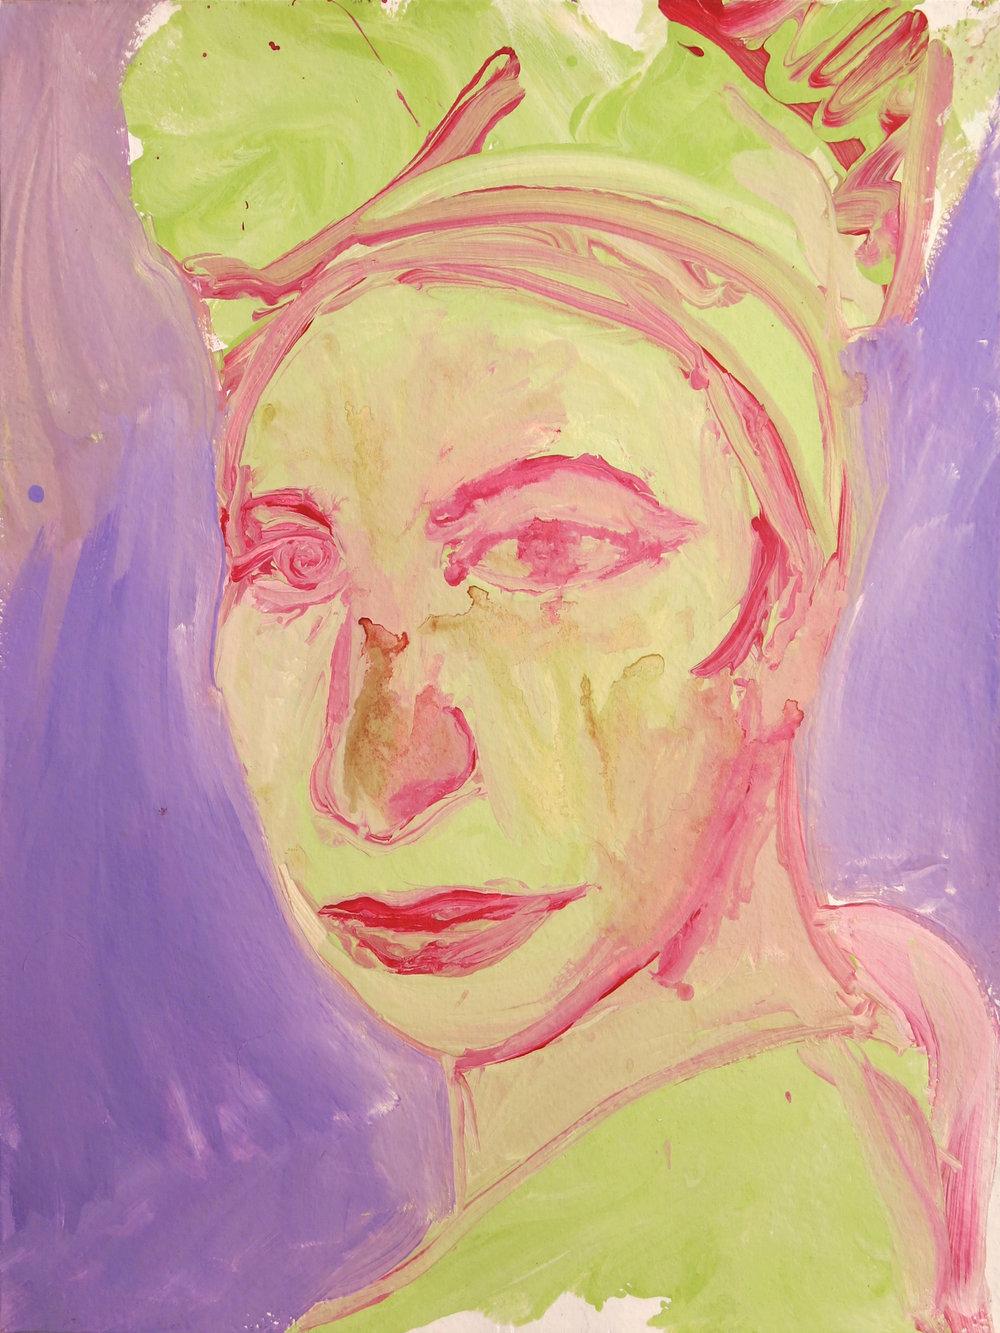 Barbra Streisand Portrait #225